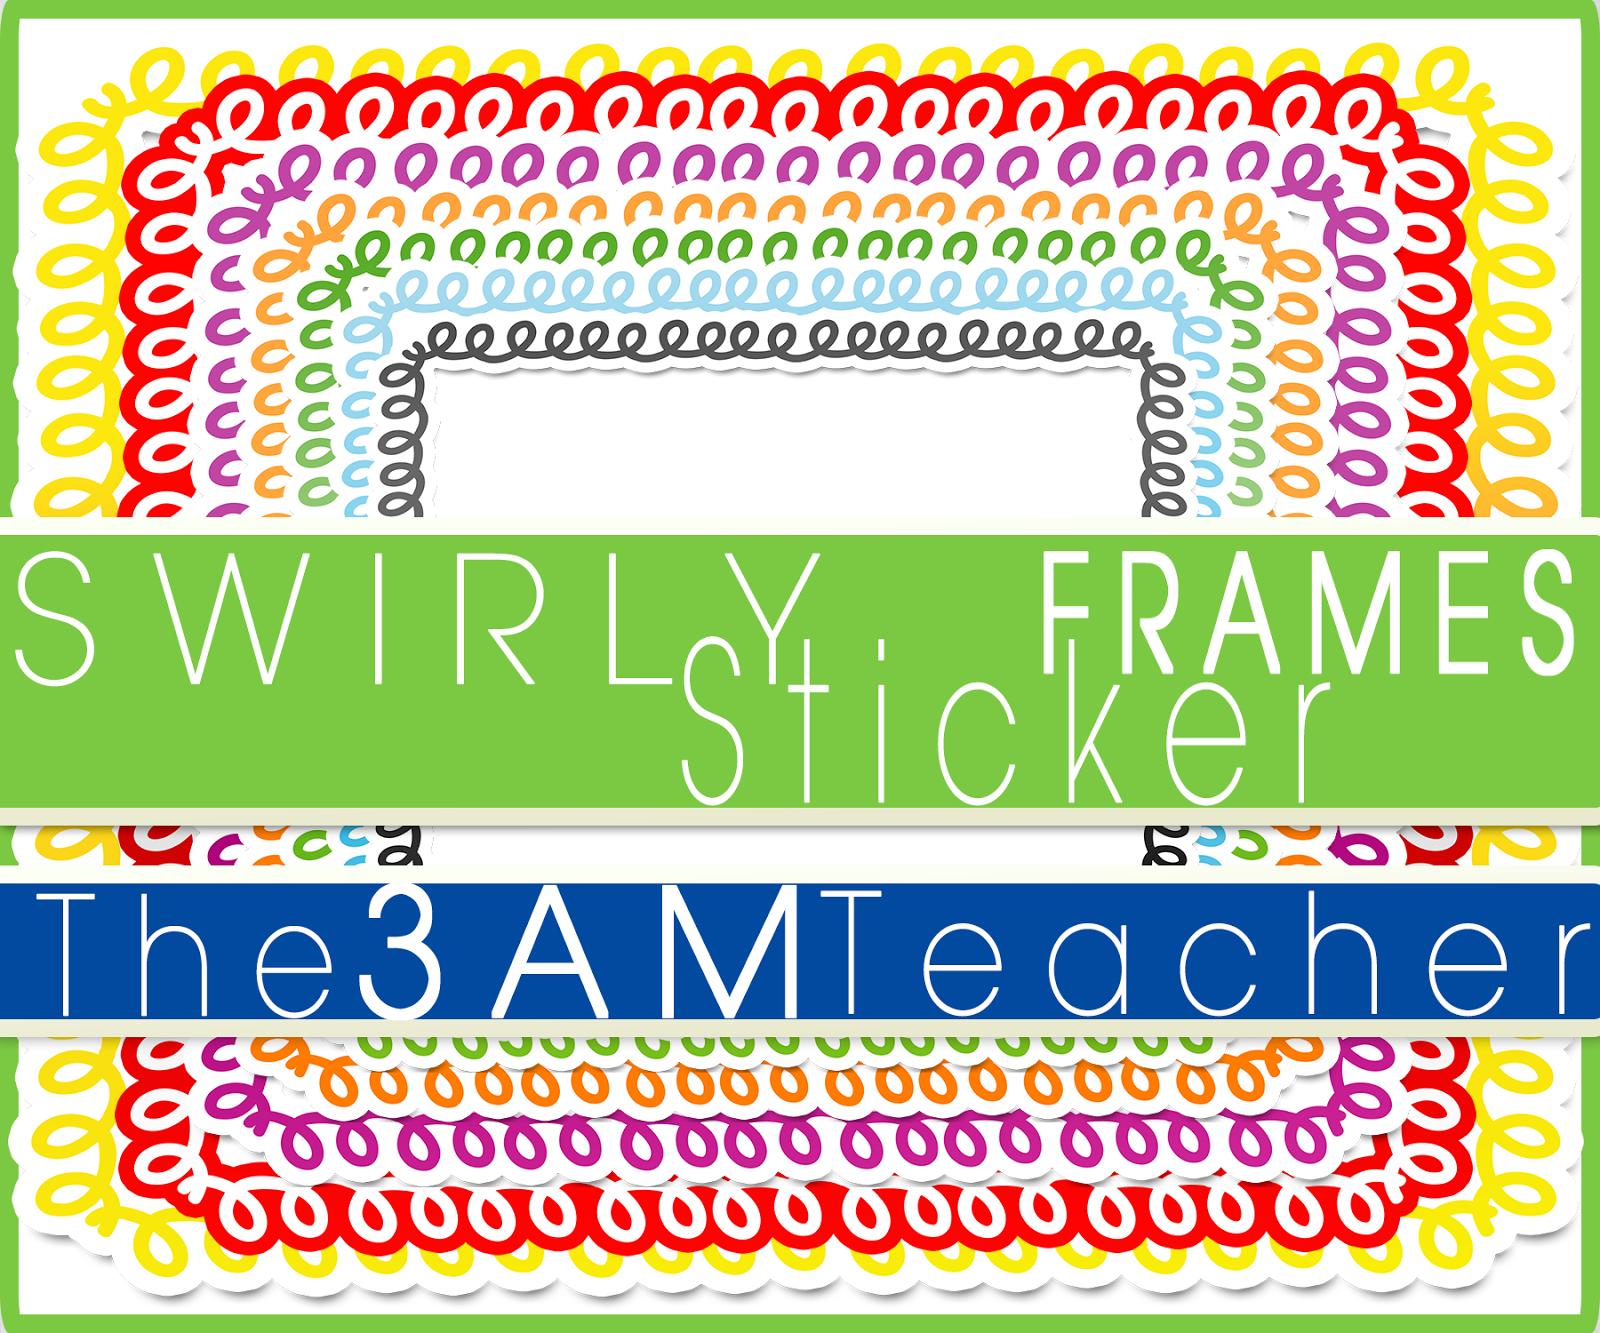 FREE Swirly Sticker Style Frames By The 3AM Teache